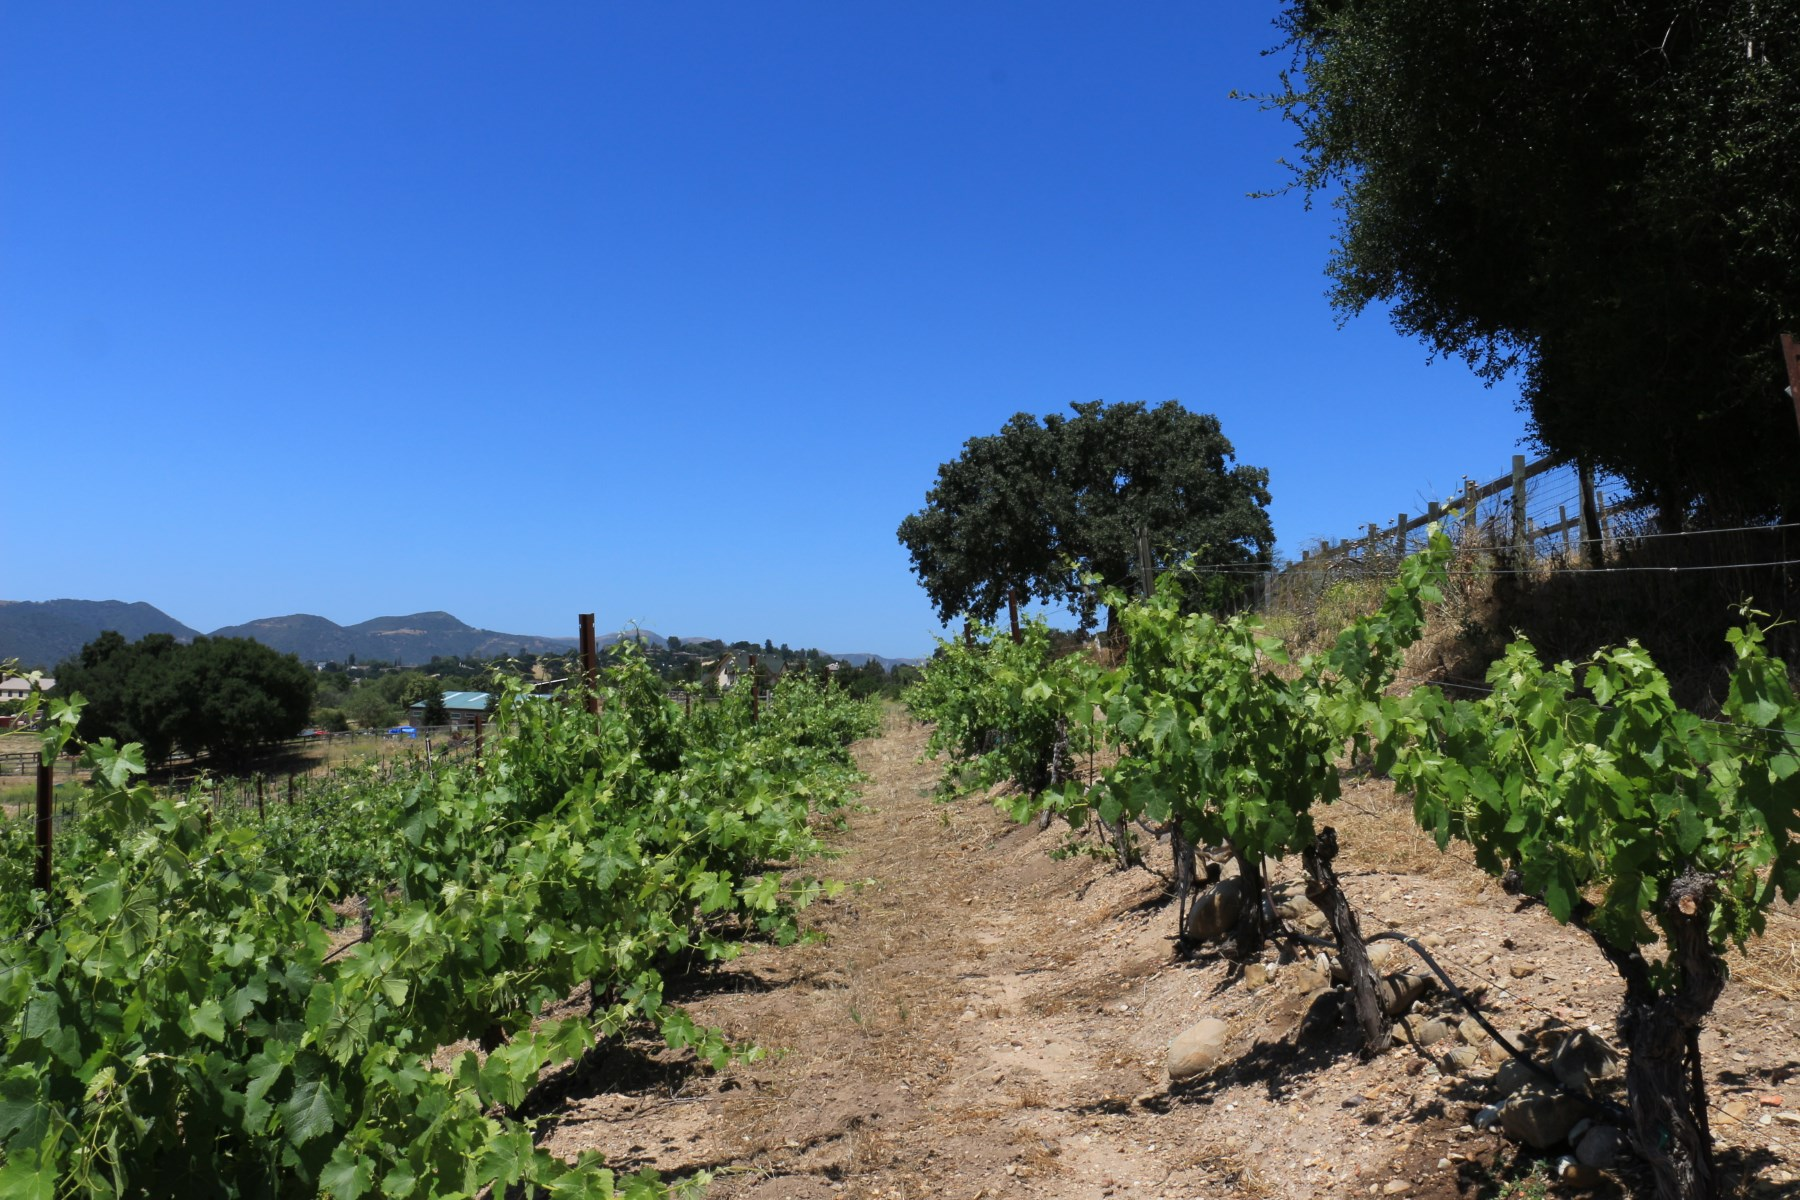 Terreno por un Venta en Agricultural Opportunity 0 Alamo Pintado Road Solvang, California, 93463 Estados Unidos